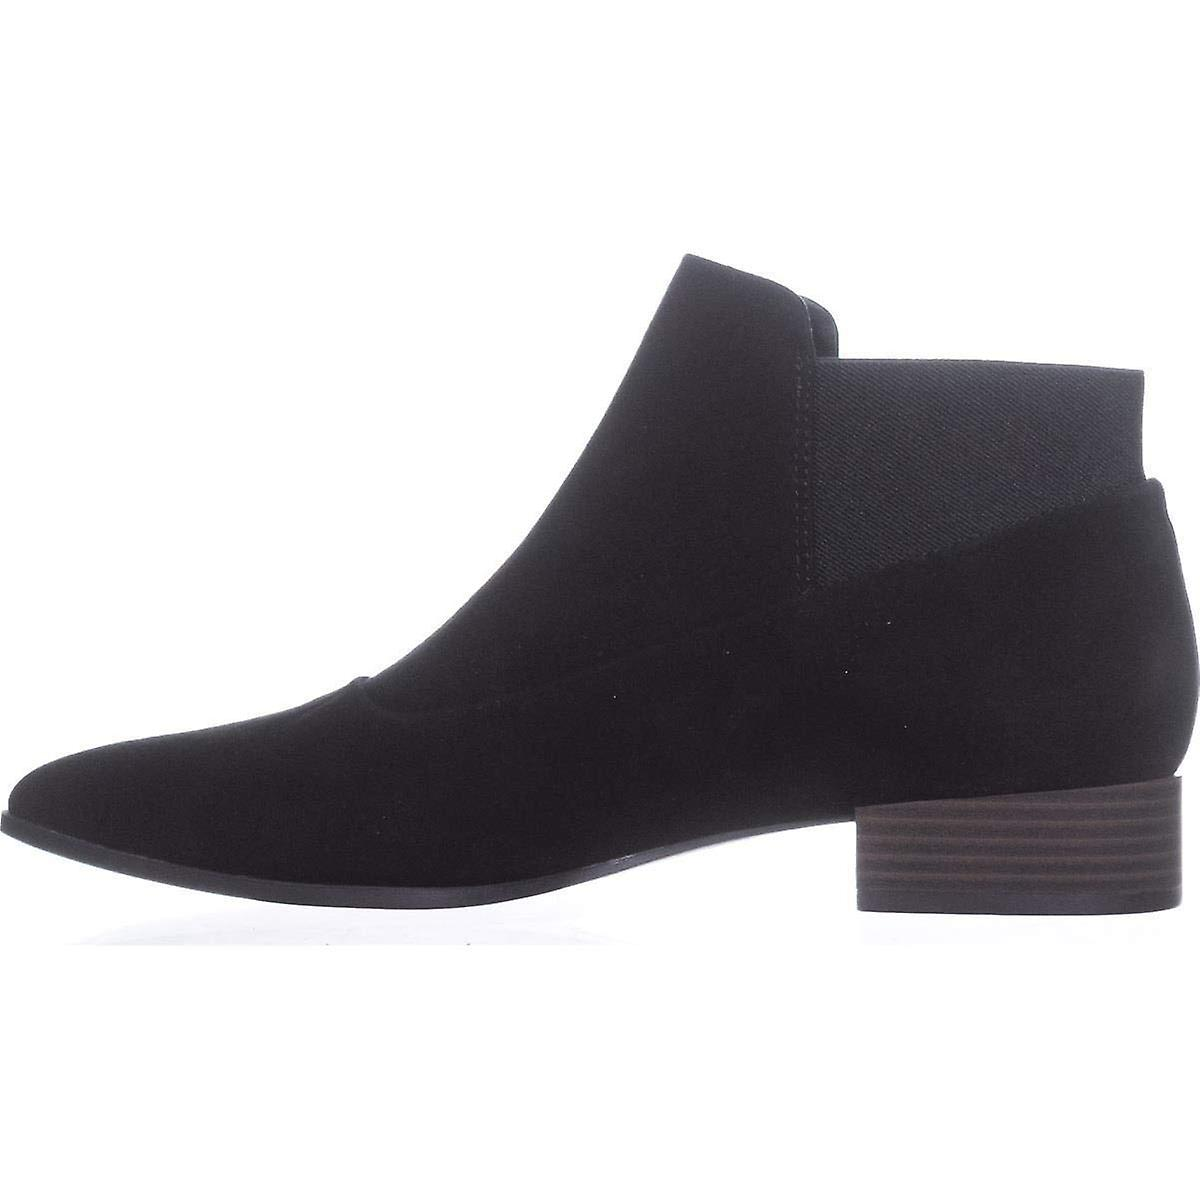 DKNY Trent wskazał toe buty pull-na, czarny, 8,5 USA/39 UE FPoU6